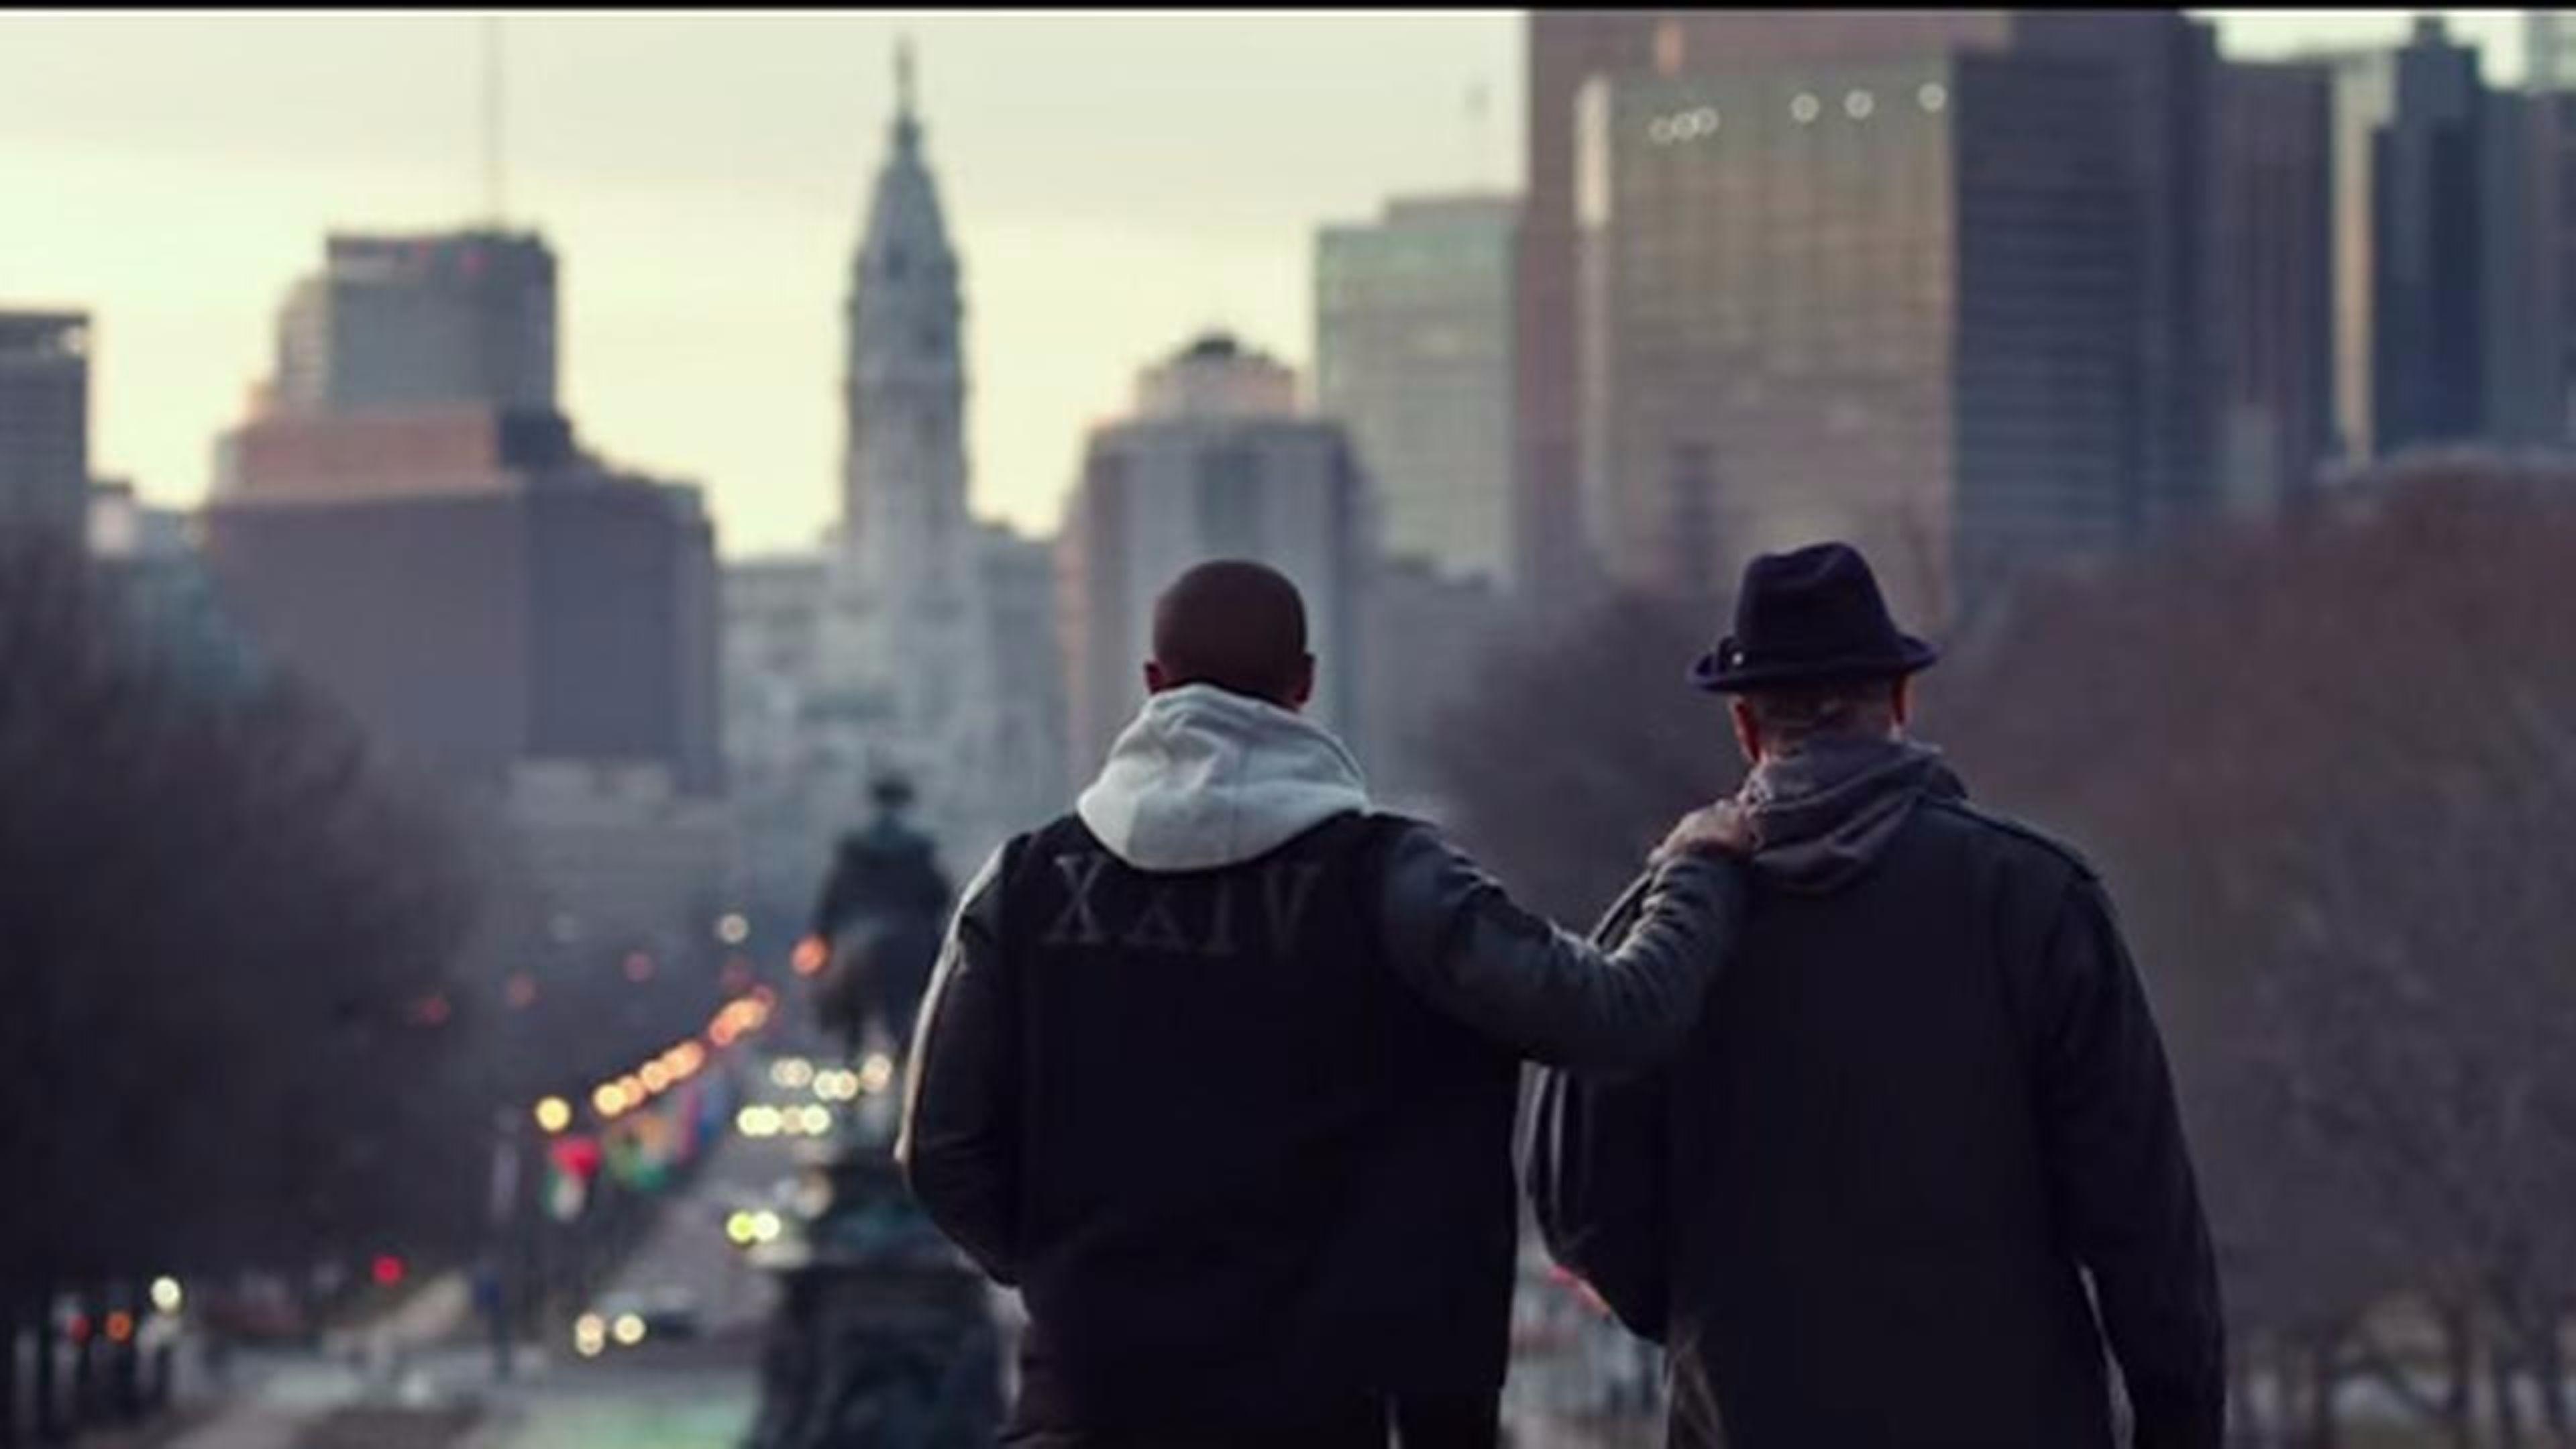 Inspirational Creed Movie 4K Wallpaper 4K Wallpaper 3840x2160